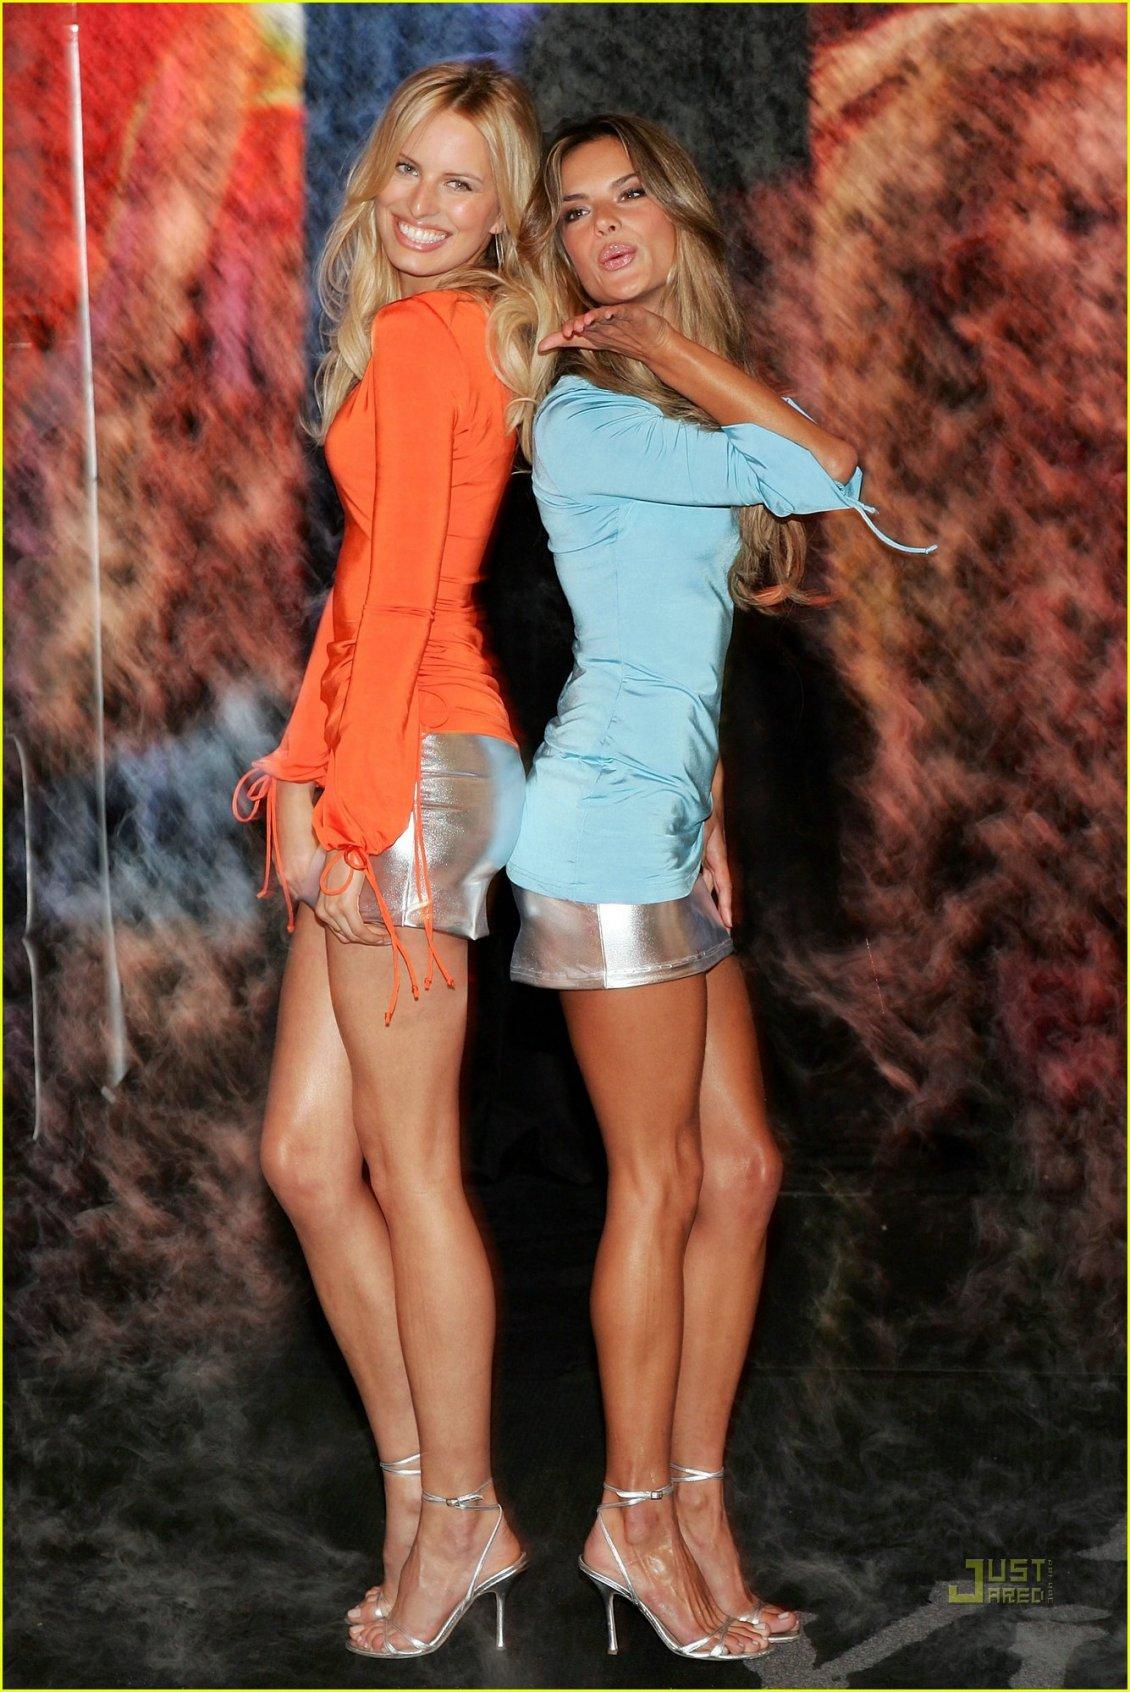 Bmw Wallpaper Hd Free Download Victorias Secret Models In Blue And Orange Dress